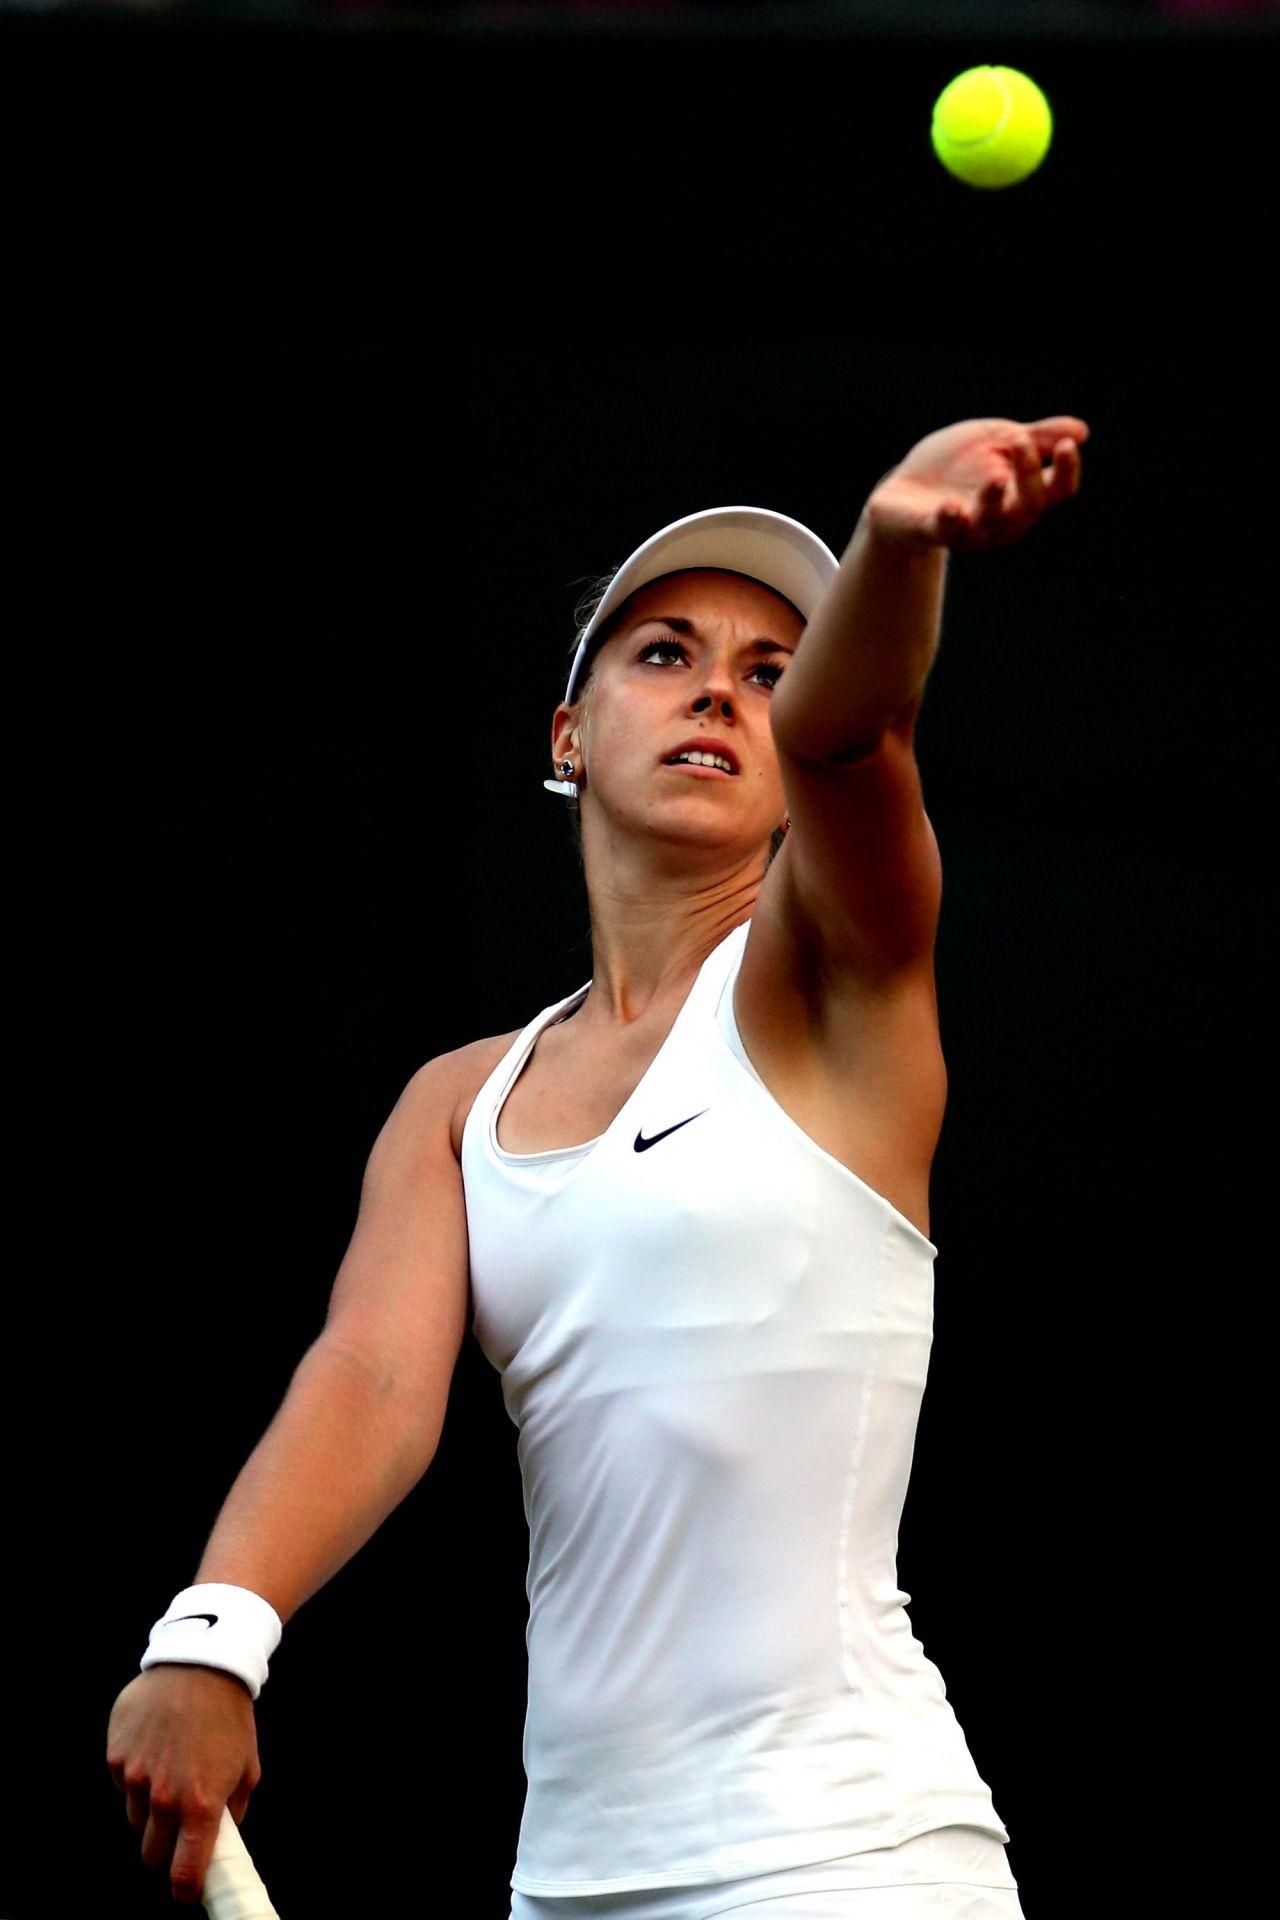 Sabine Lisicki Wimbledon Tennis Championships 2014 3rd